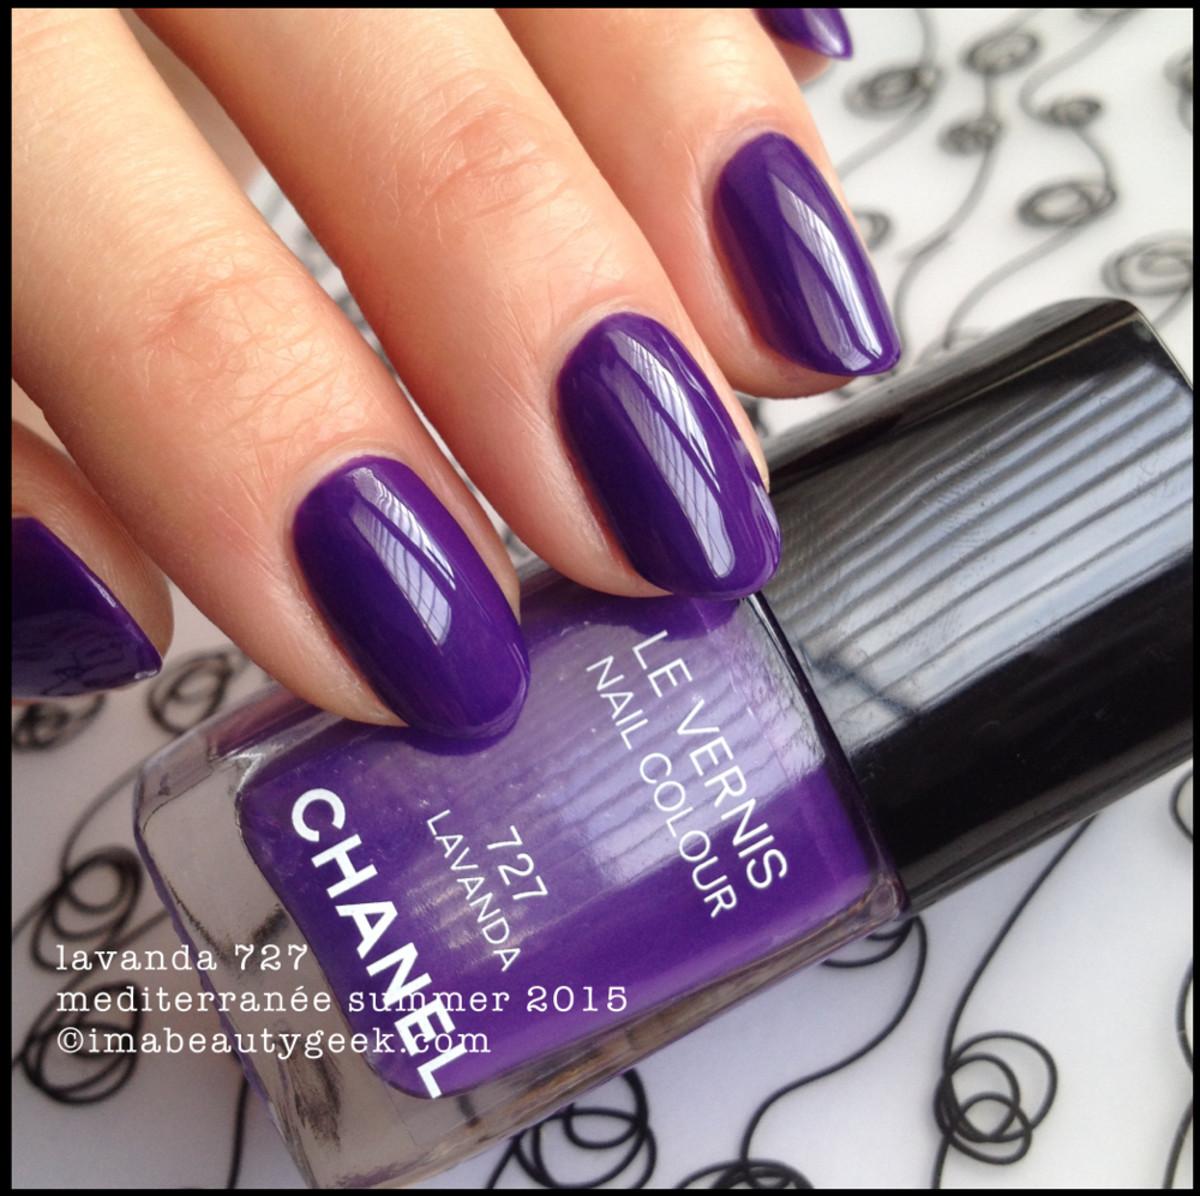 Chanel Mediterranee Summer 2015_Chanel Lavanda 727 Le Vernis